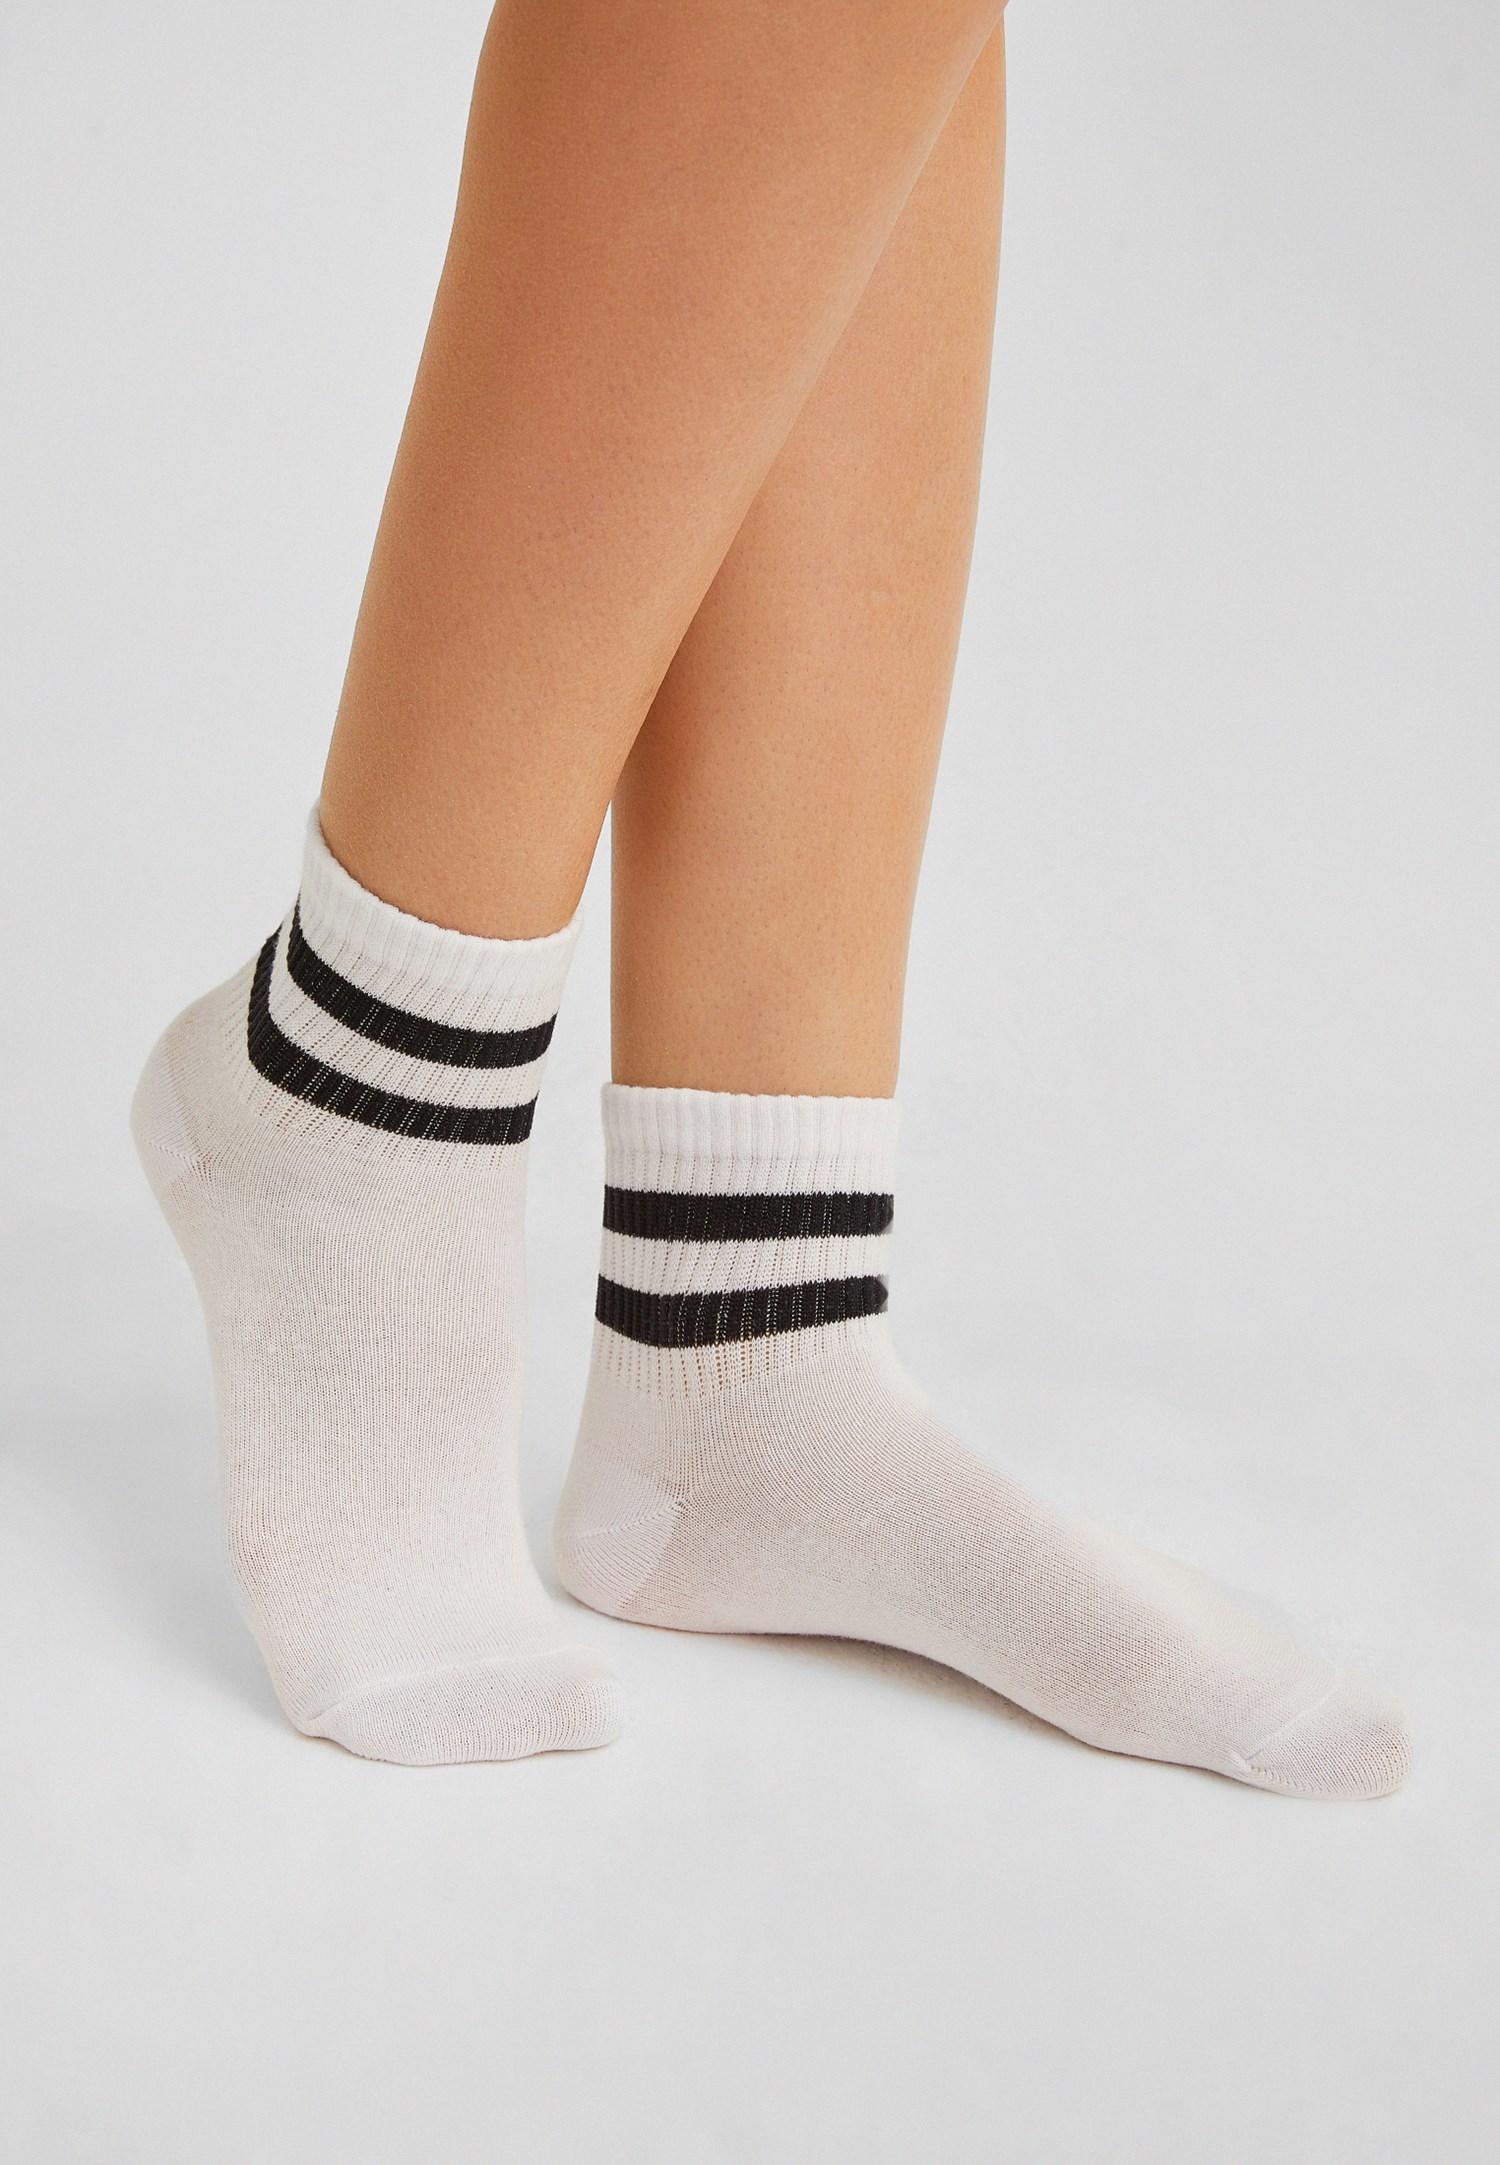 Bayan Siyah Çizgili Çorap